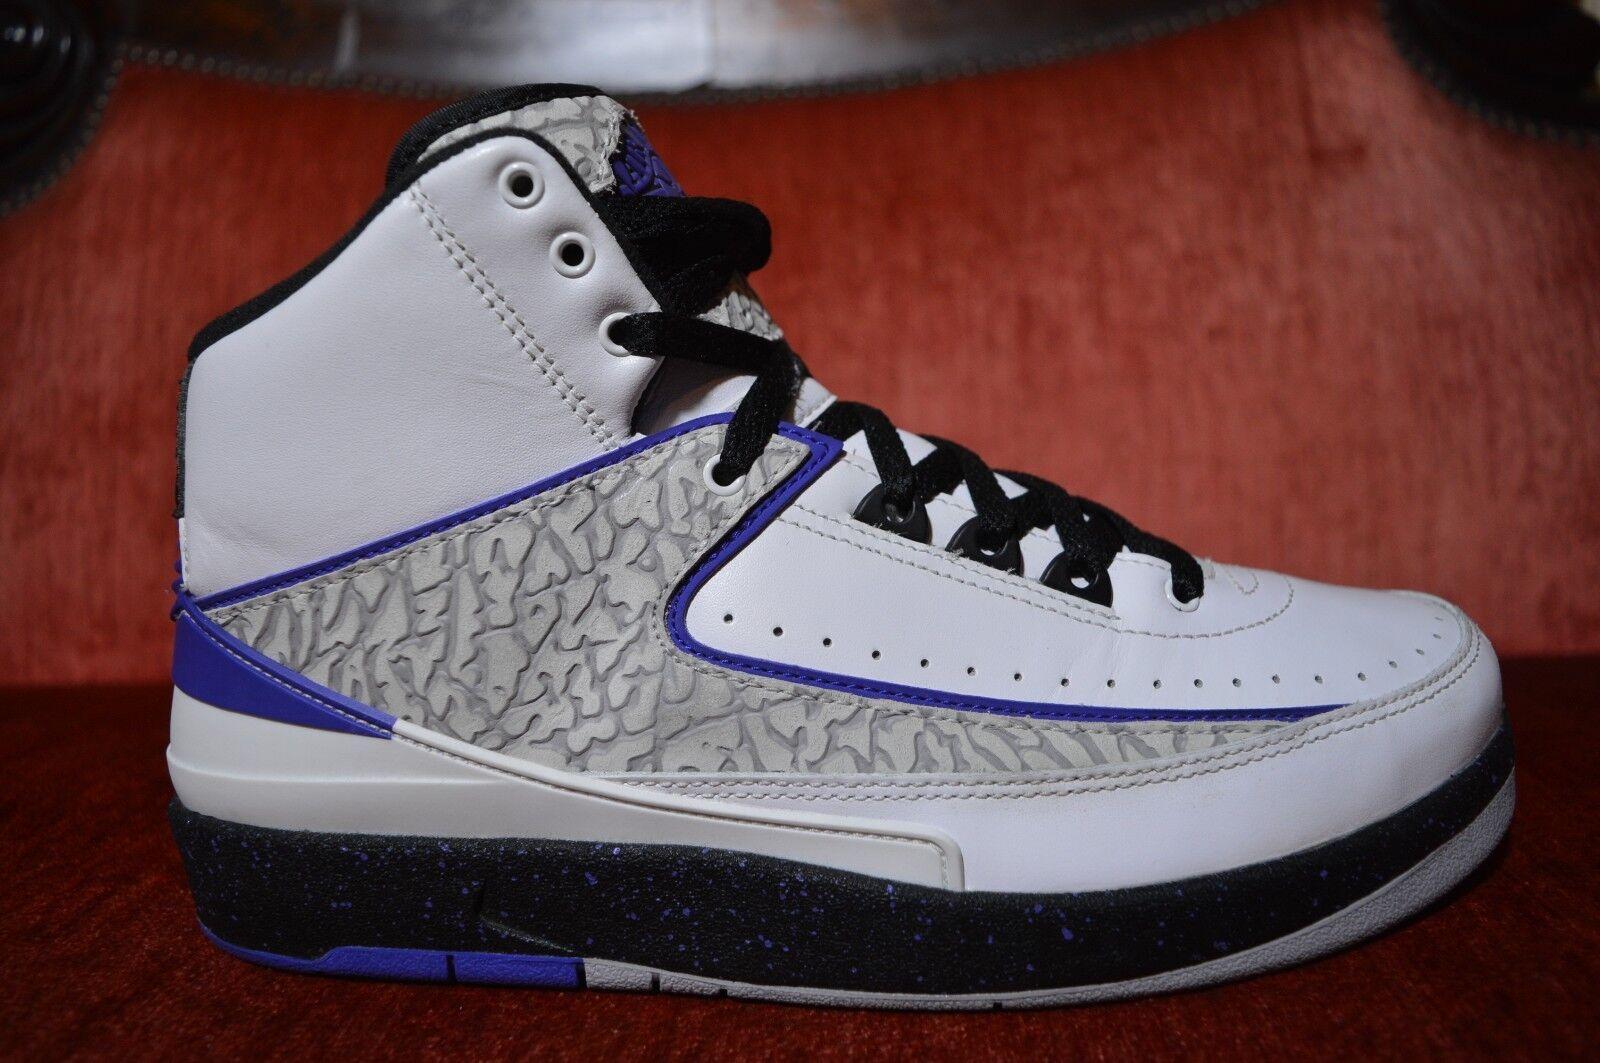 CLEAN Nike Air Jordan 2 II retro concord Pink White 385475-153 Size 8